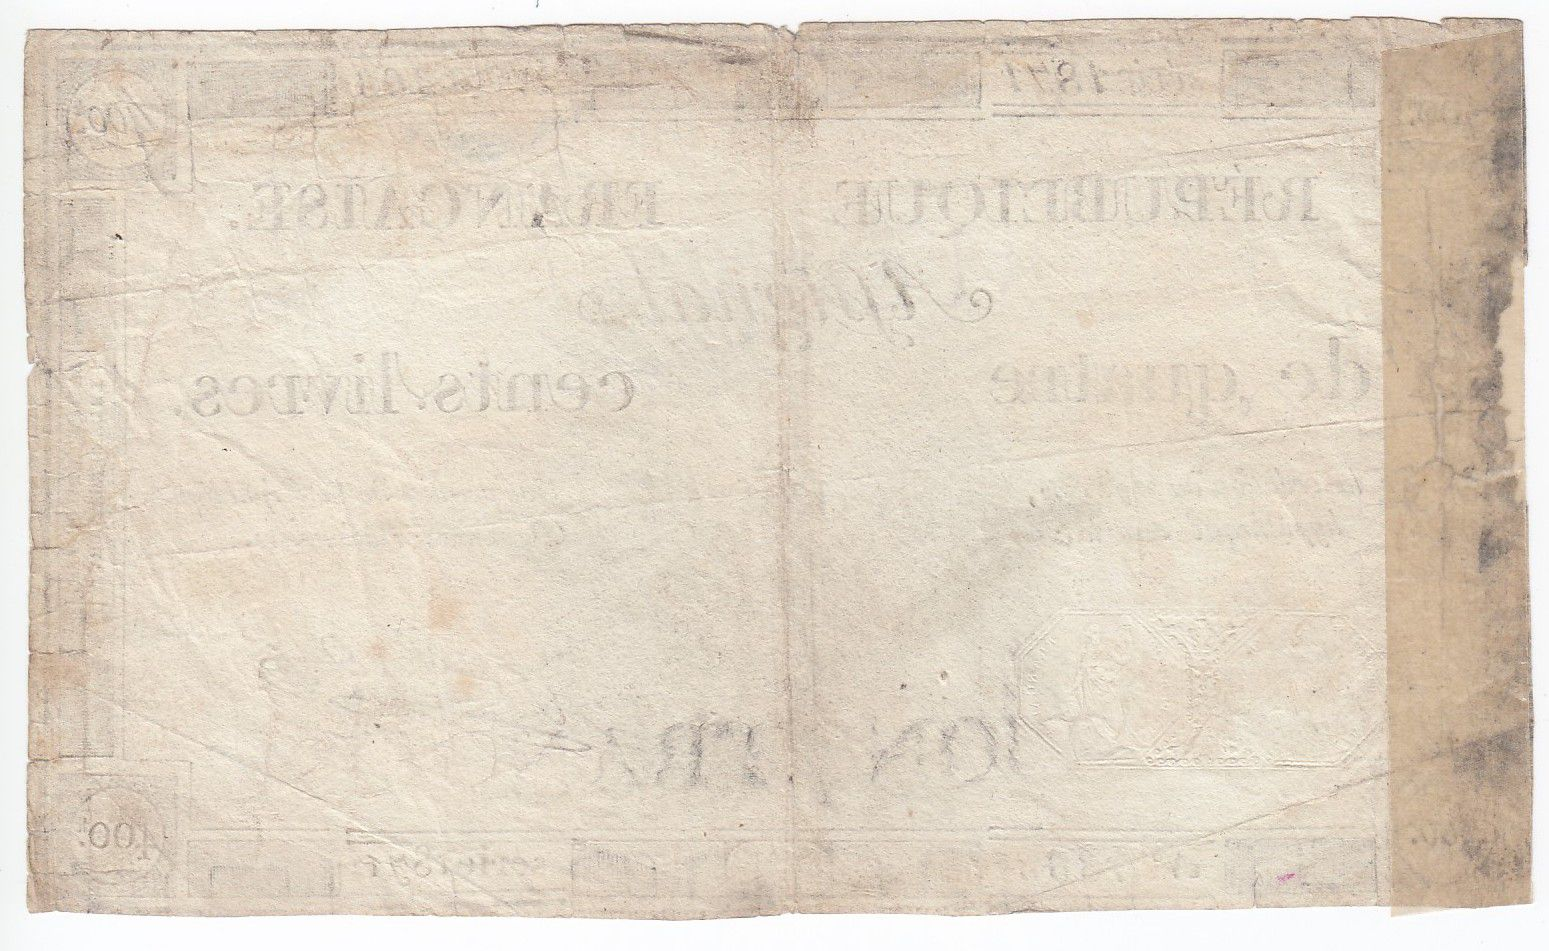 France 400 Livres 21-11-1792 - Sign. Gaillard Serial 1871 - VG to F